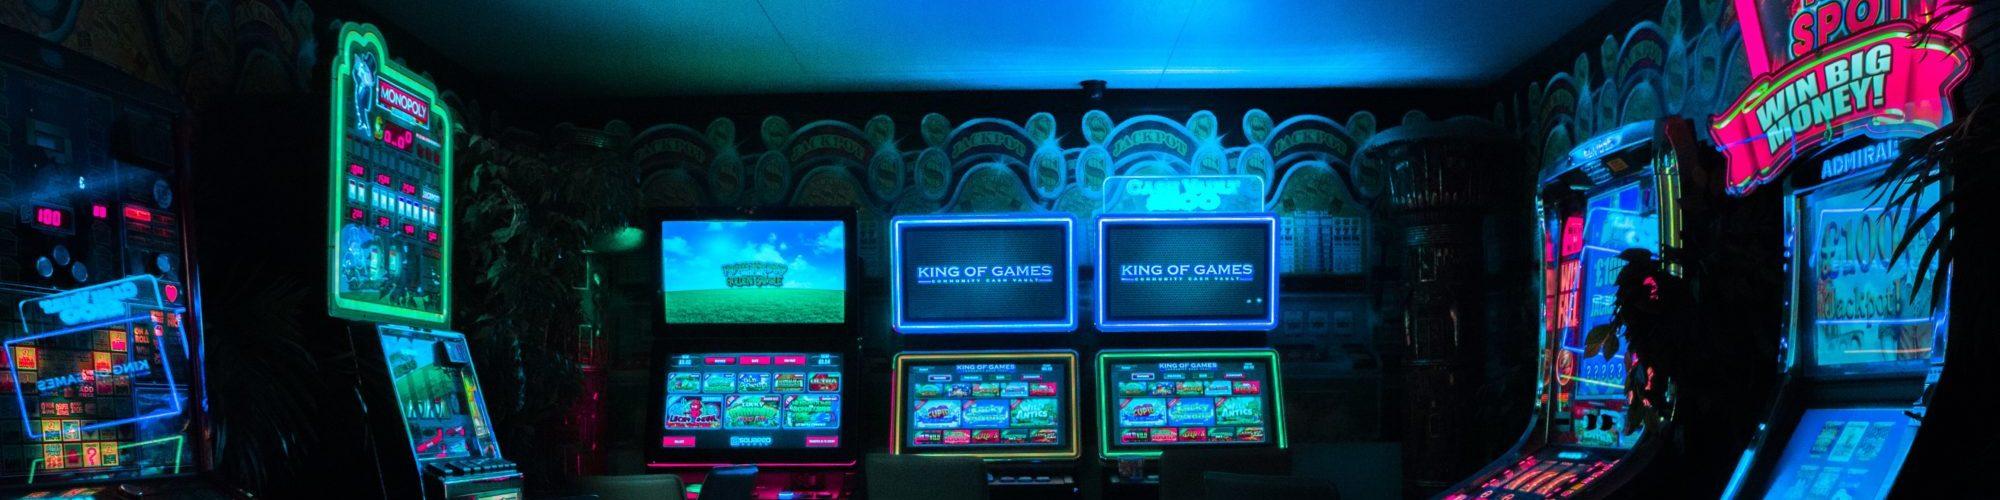 salle de gaming au chateau Vaillant internat college lycee esport